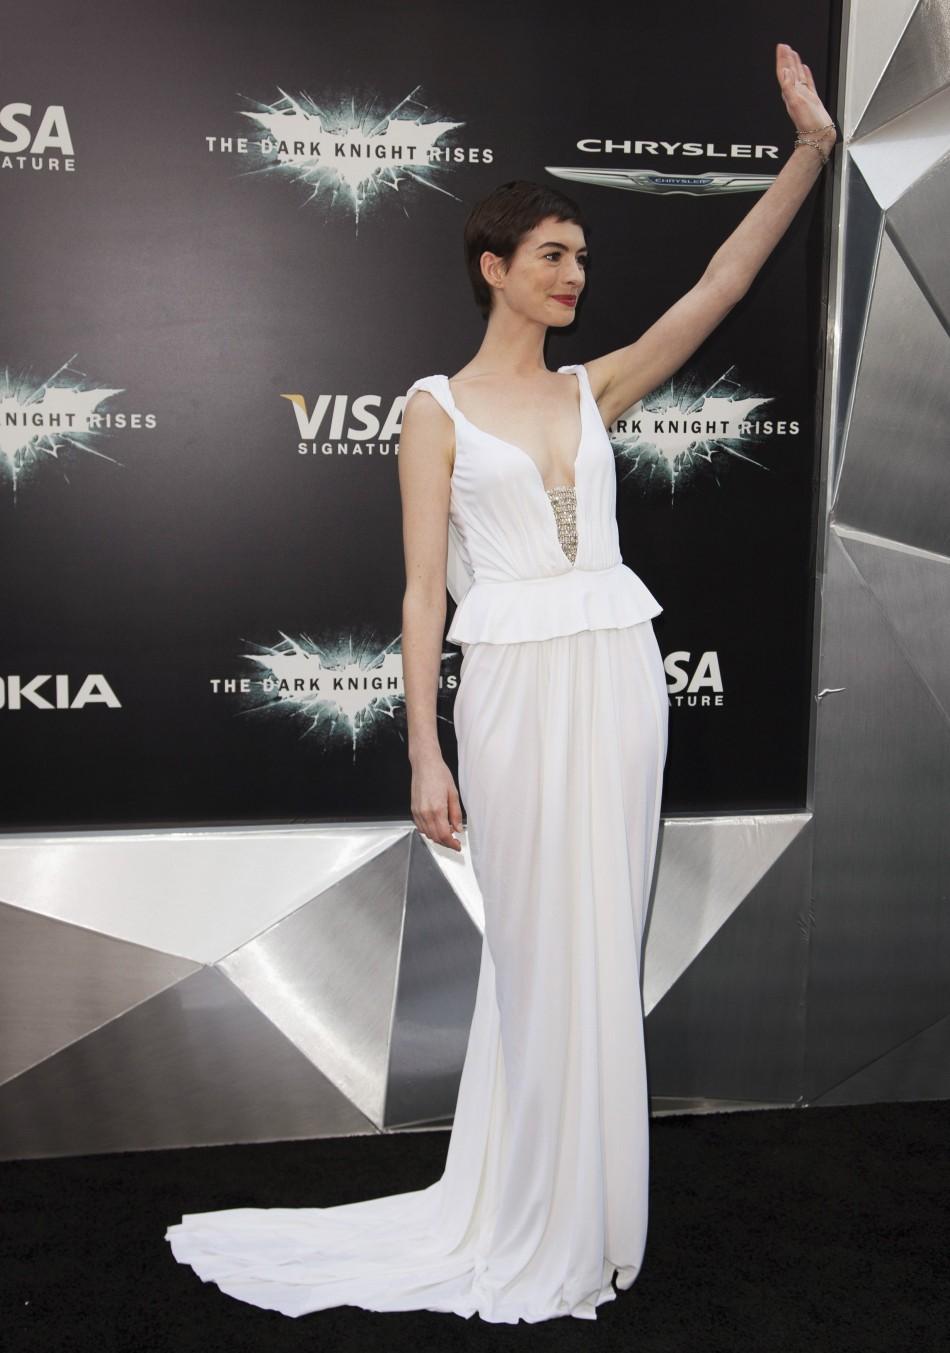 The Dark Knight Rises Batman Beauties Sizzle At The Star